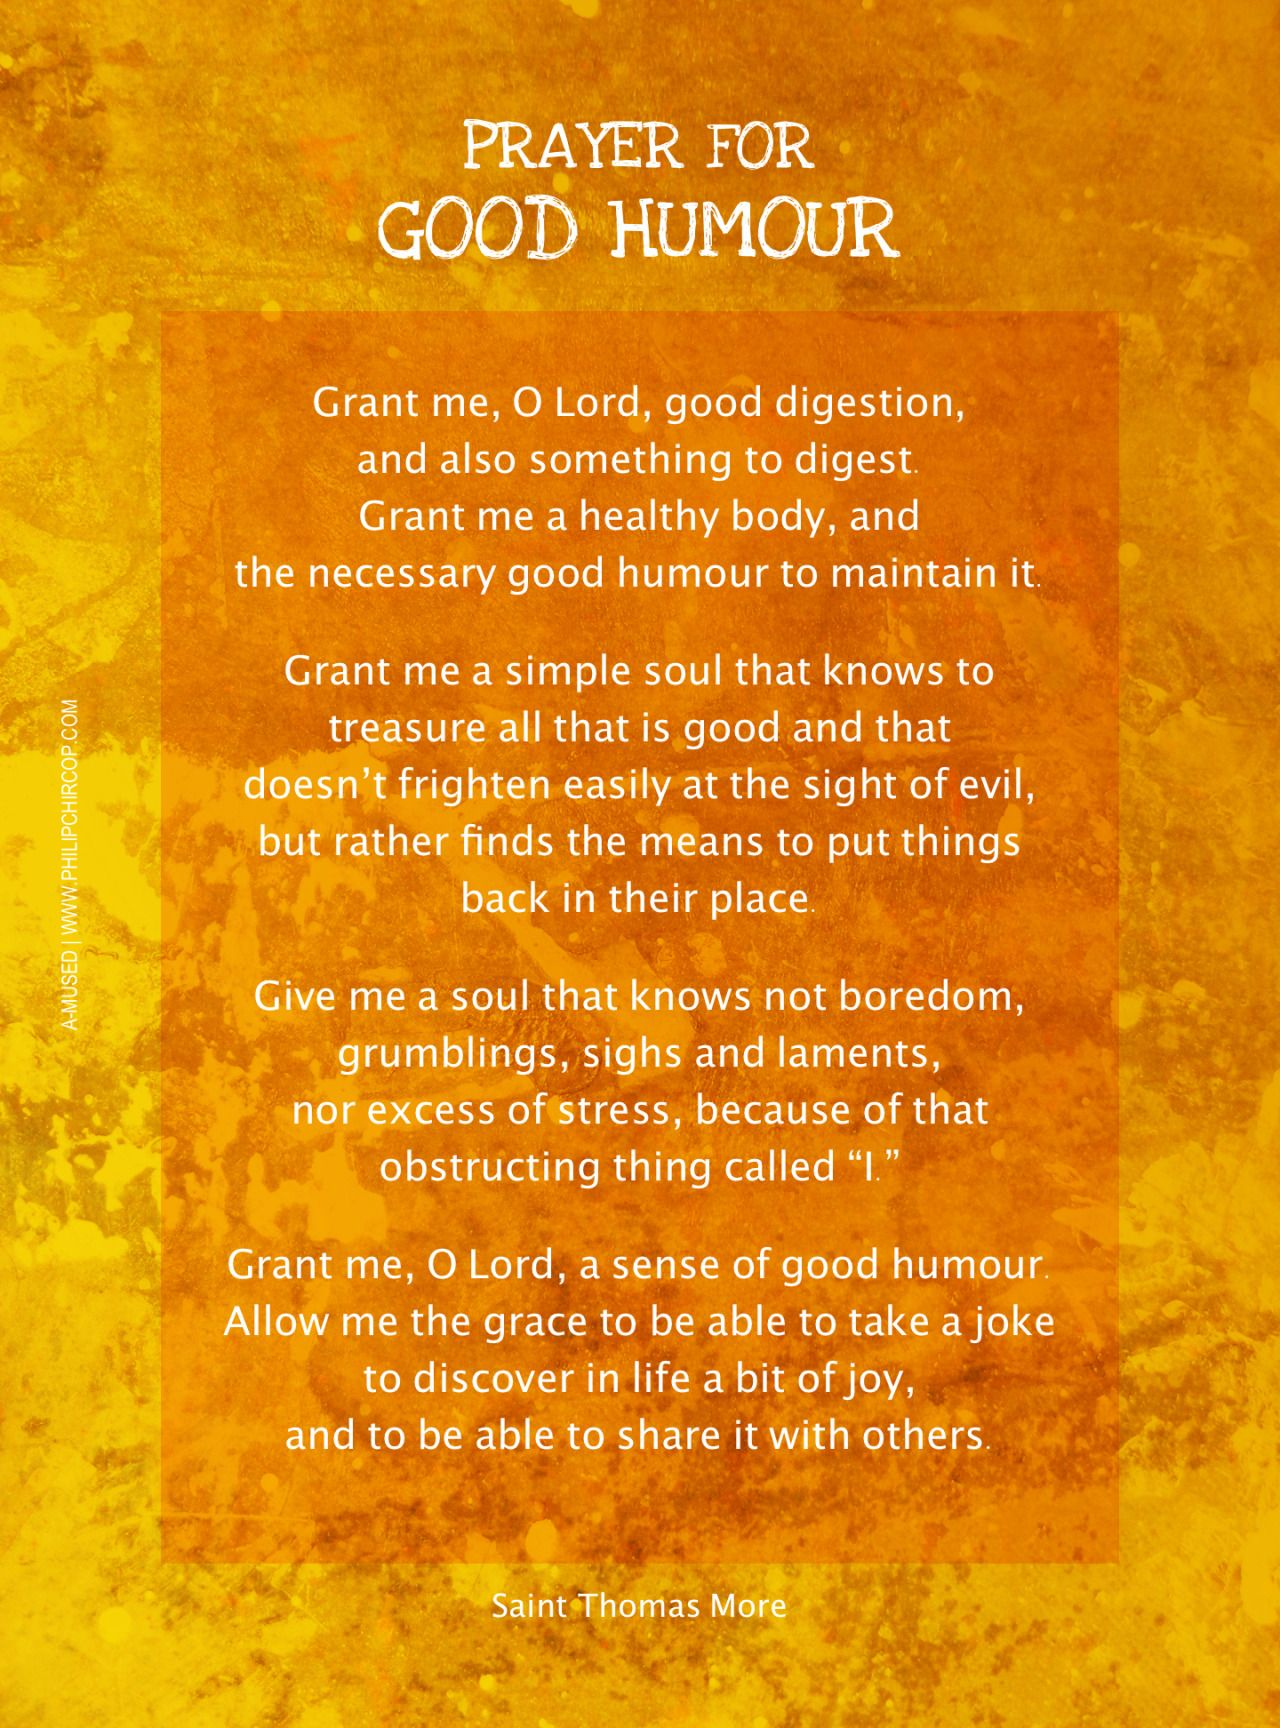 Good Humor Quotes: Prayer Sir Thomas More Good Humor